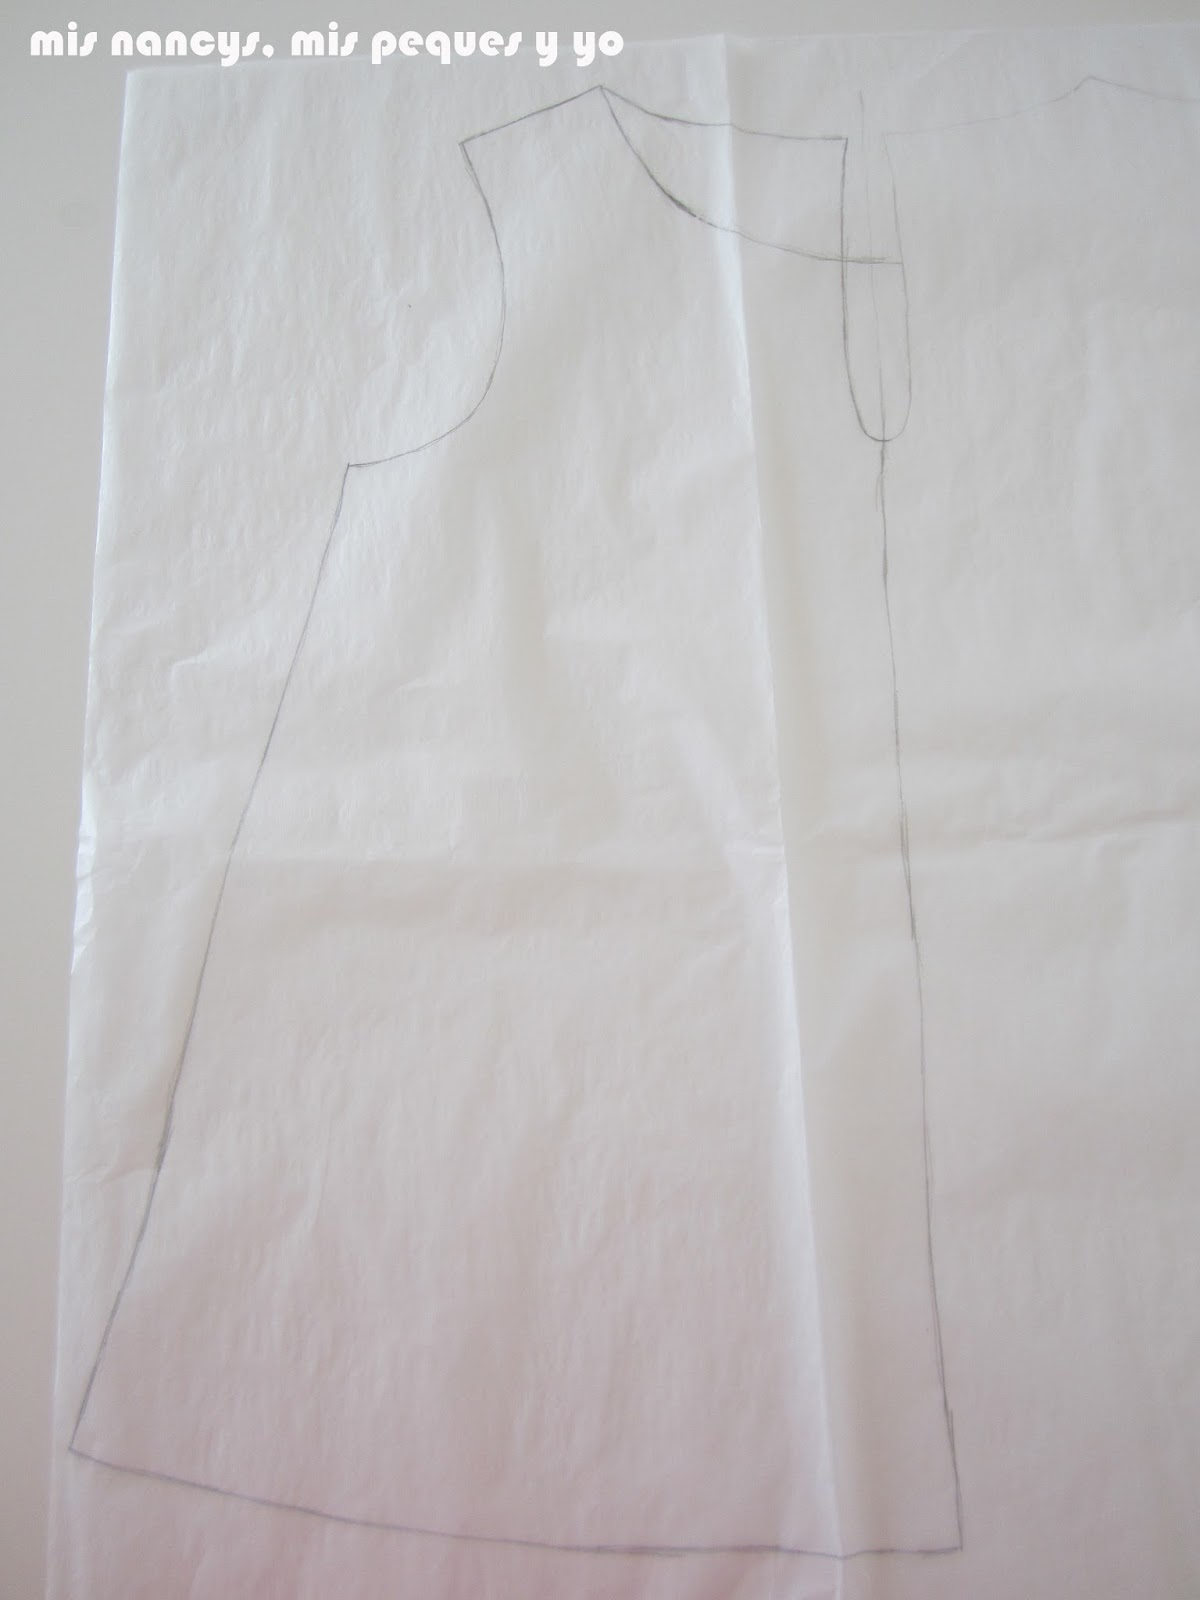 mis nancys, mis peques y yo, tutorial blusa sin mangas niña (patrón gratis), dibujar abertura blusa